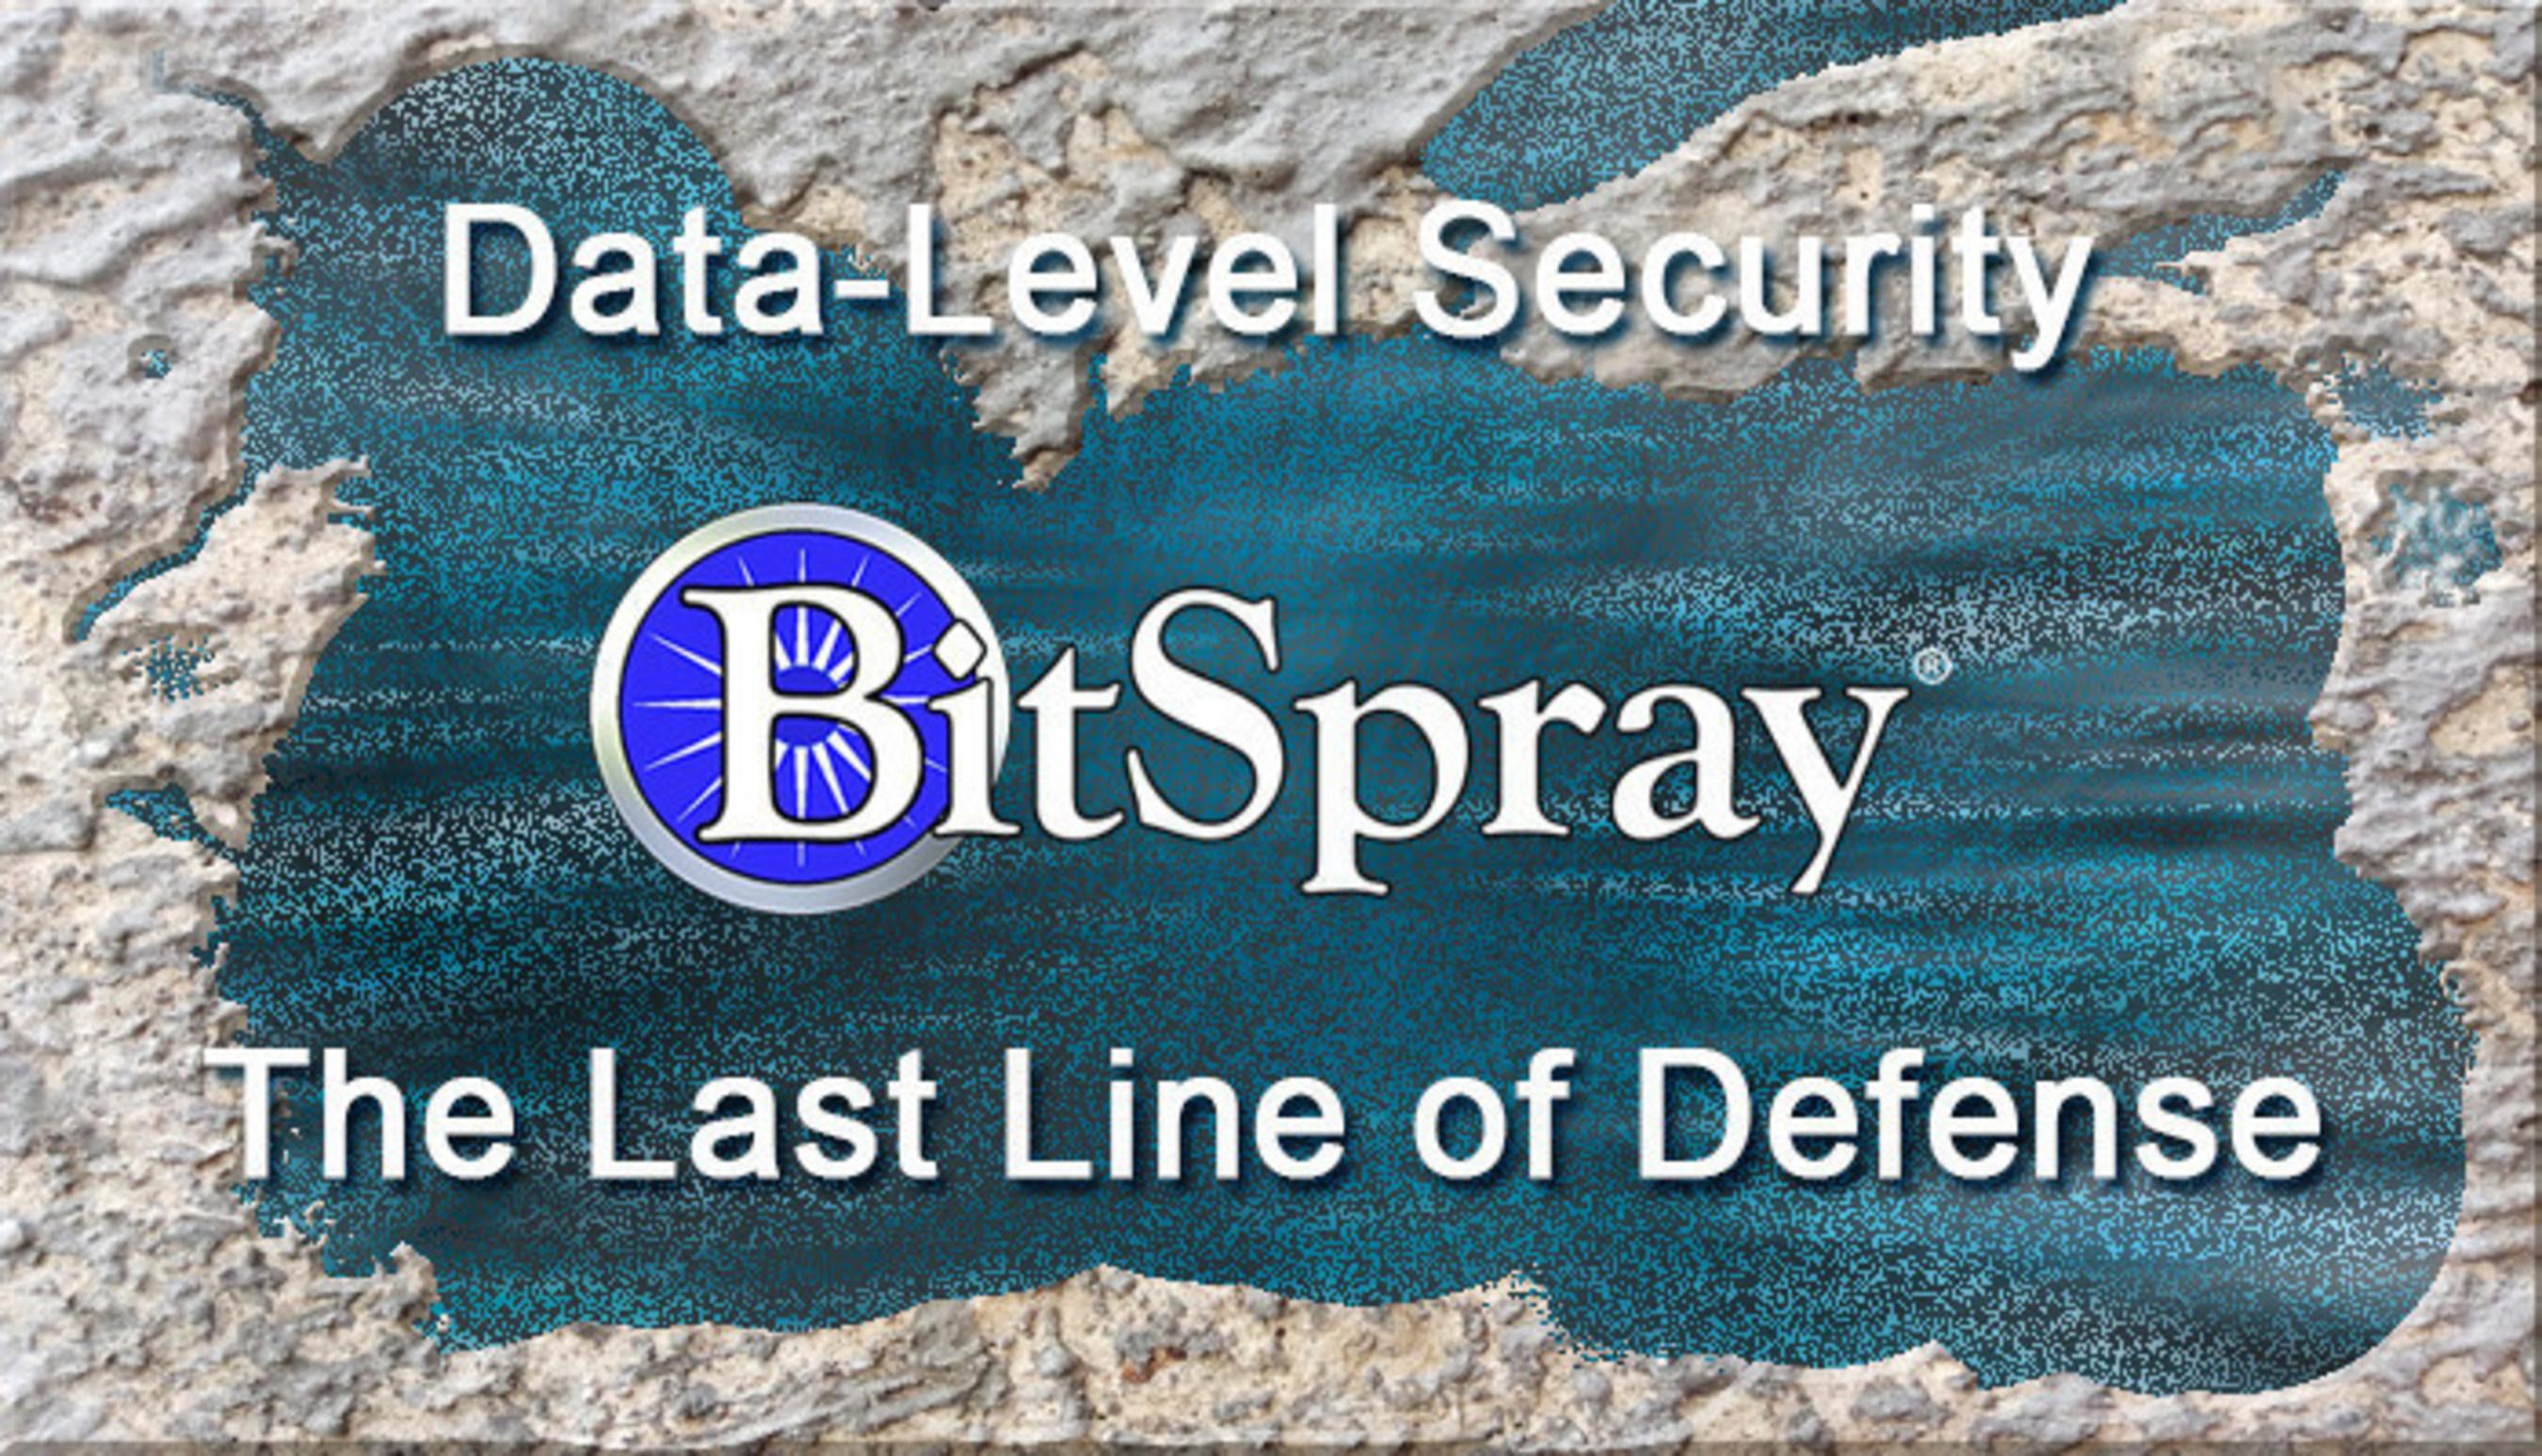 BitSpray' - The Last Line of Defense